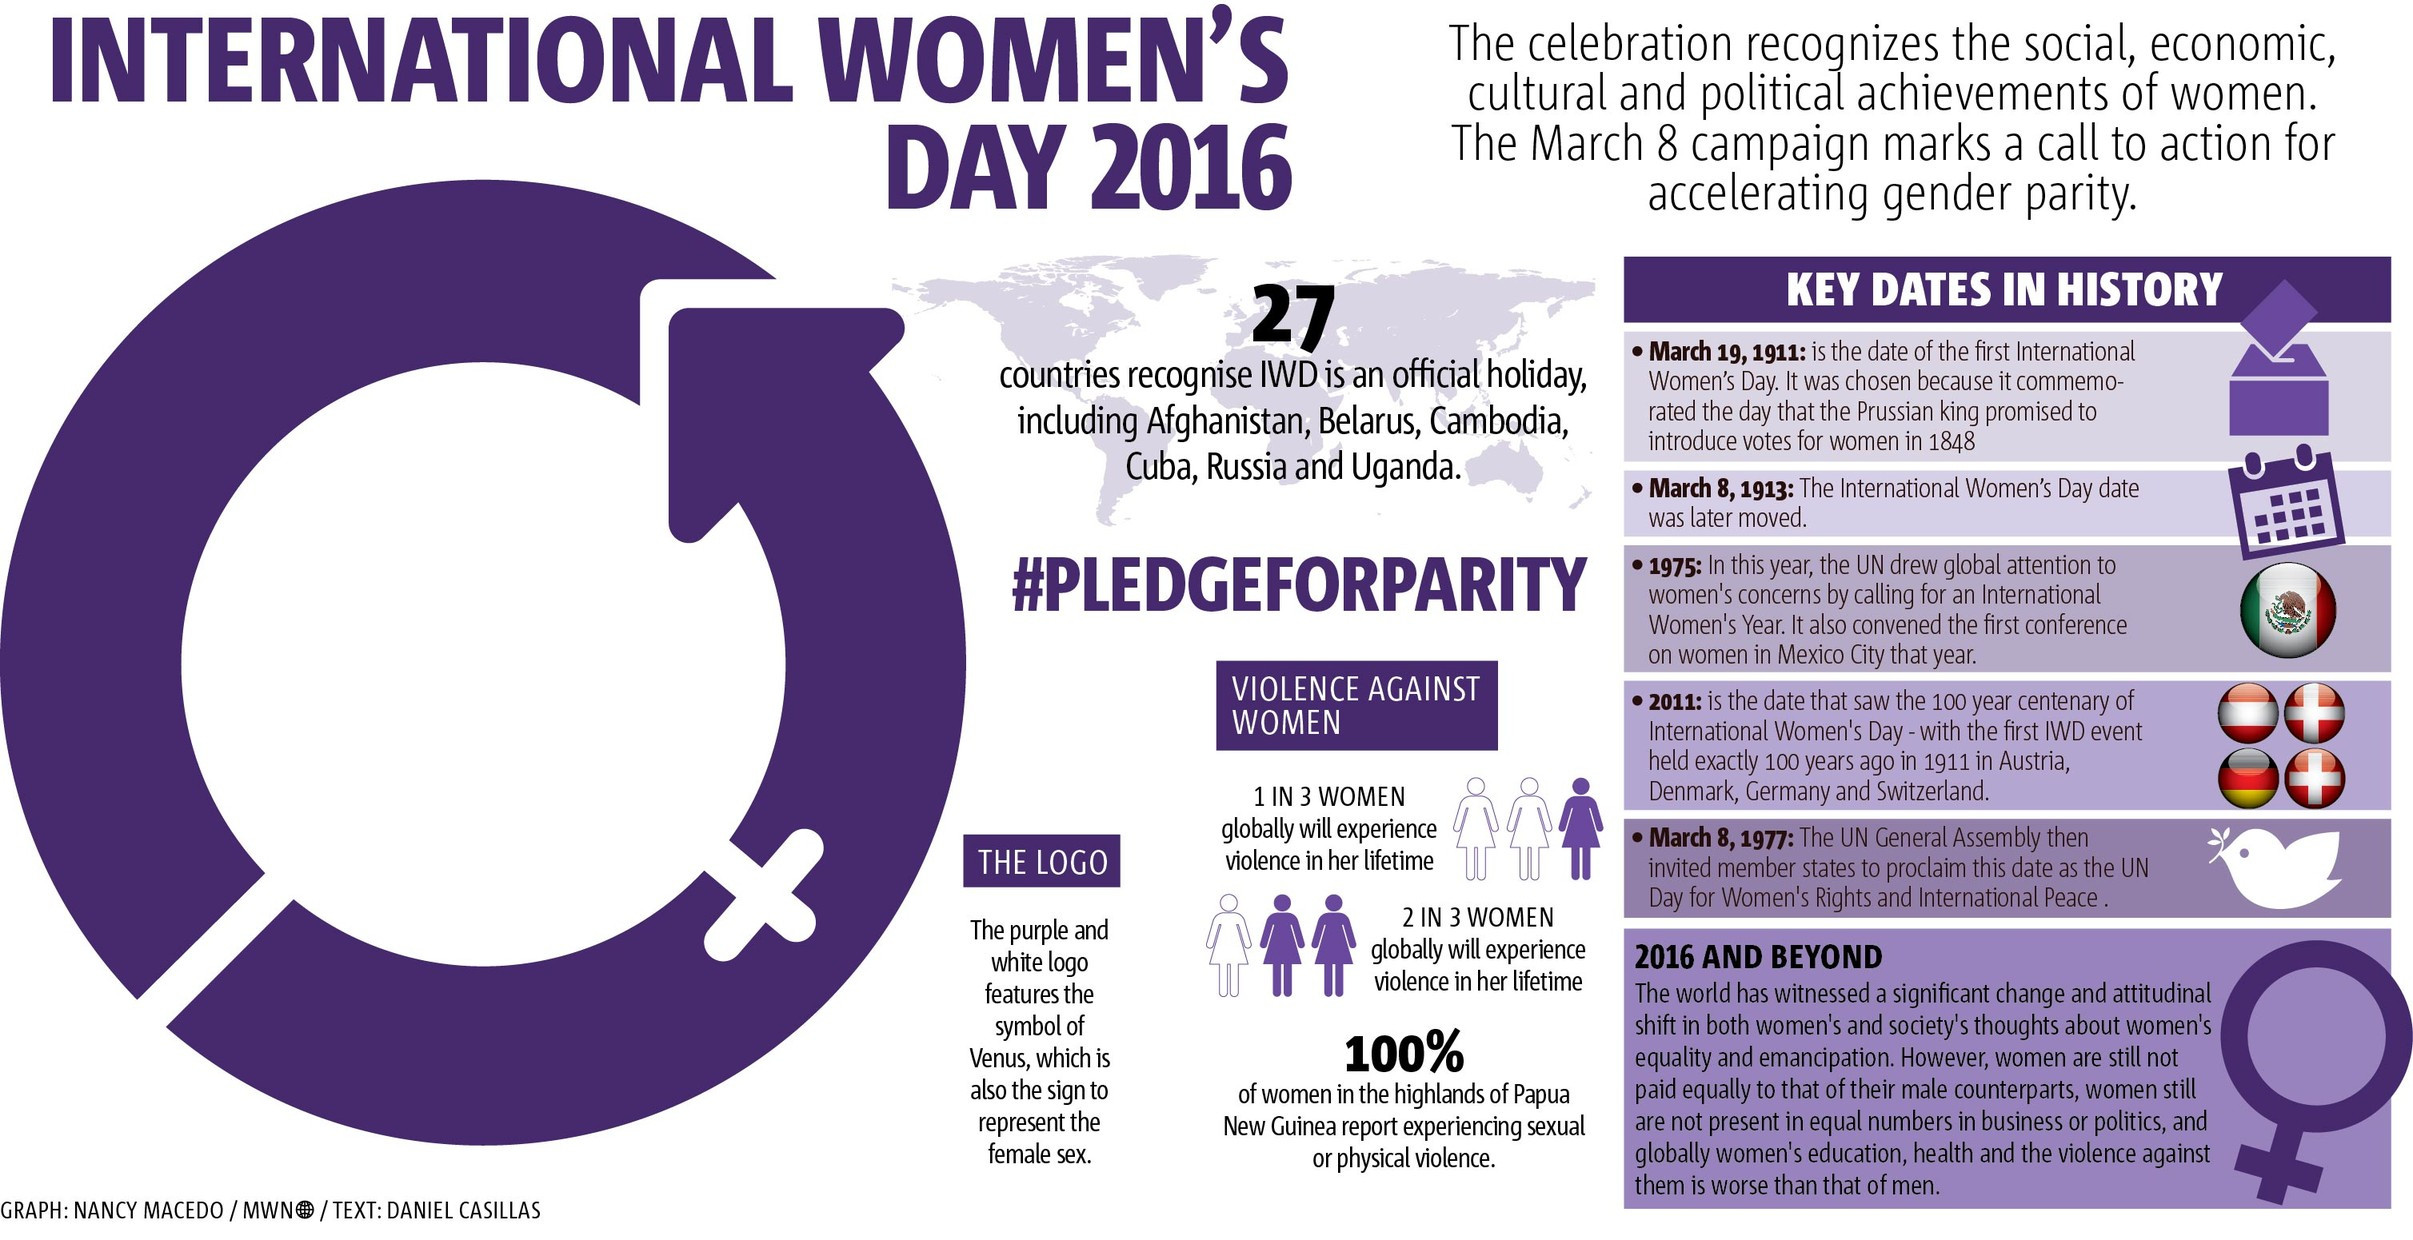 WORLD VOICE: International Women's Day 2016: Taking Action for Gender Parity